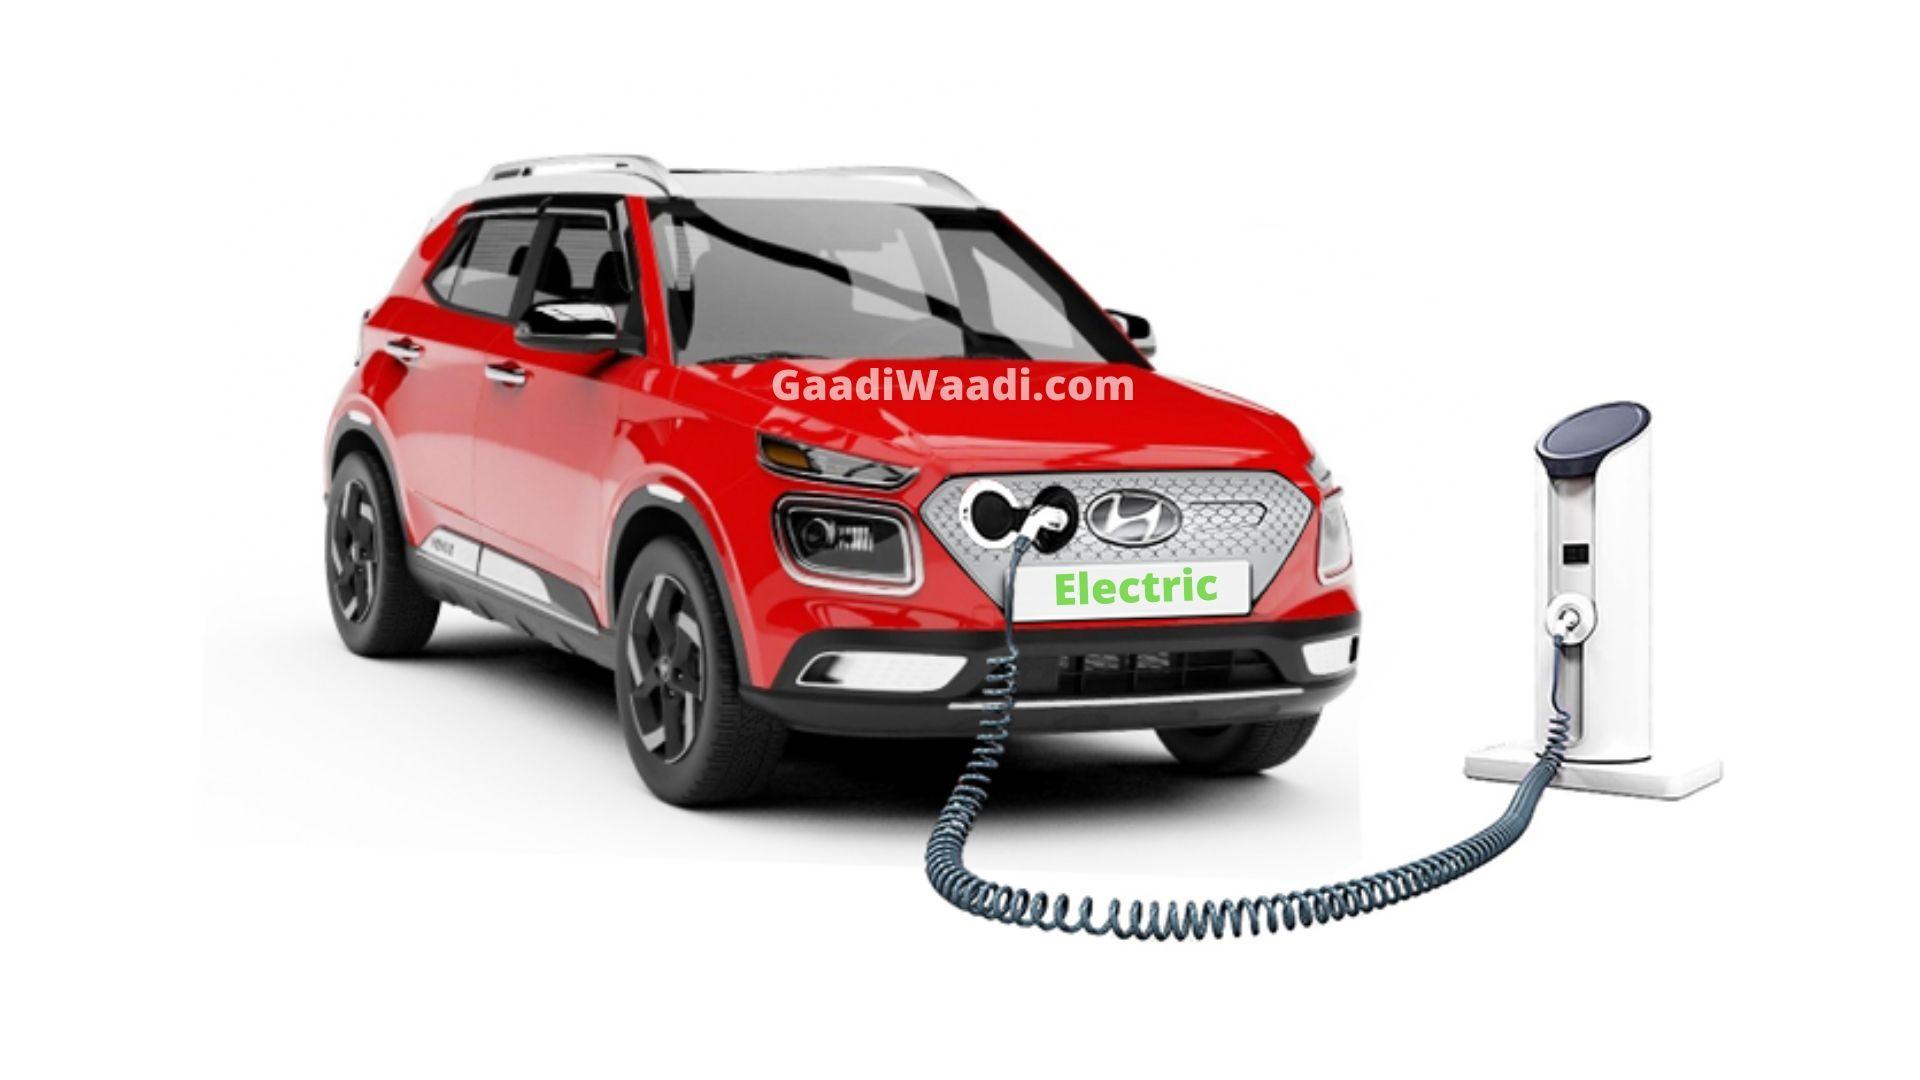 All-Electric Hyundai SUV (Nexon EV Rival) Confirmed For India Launch